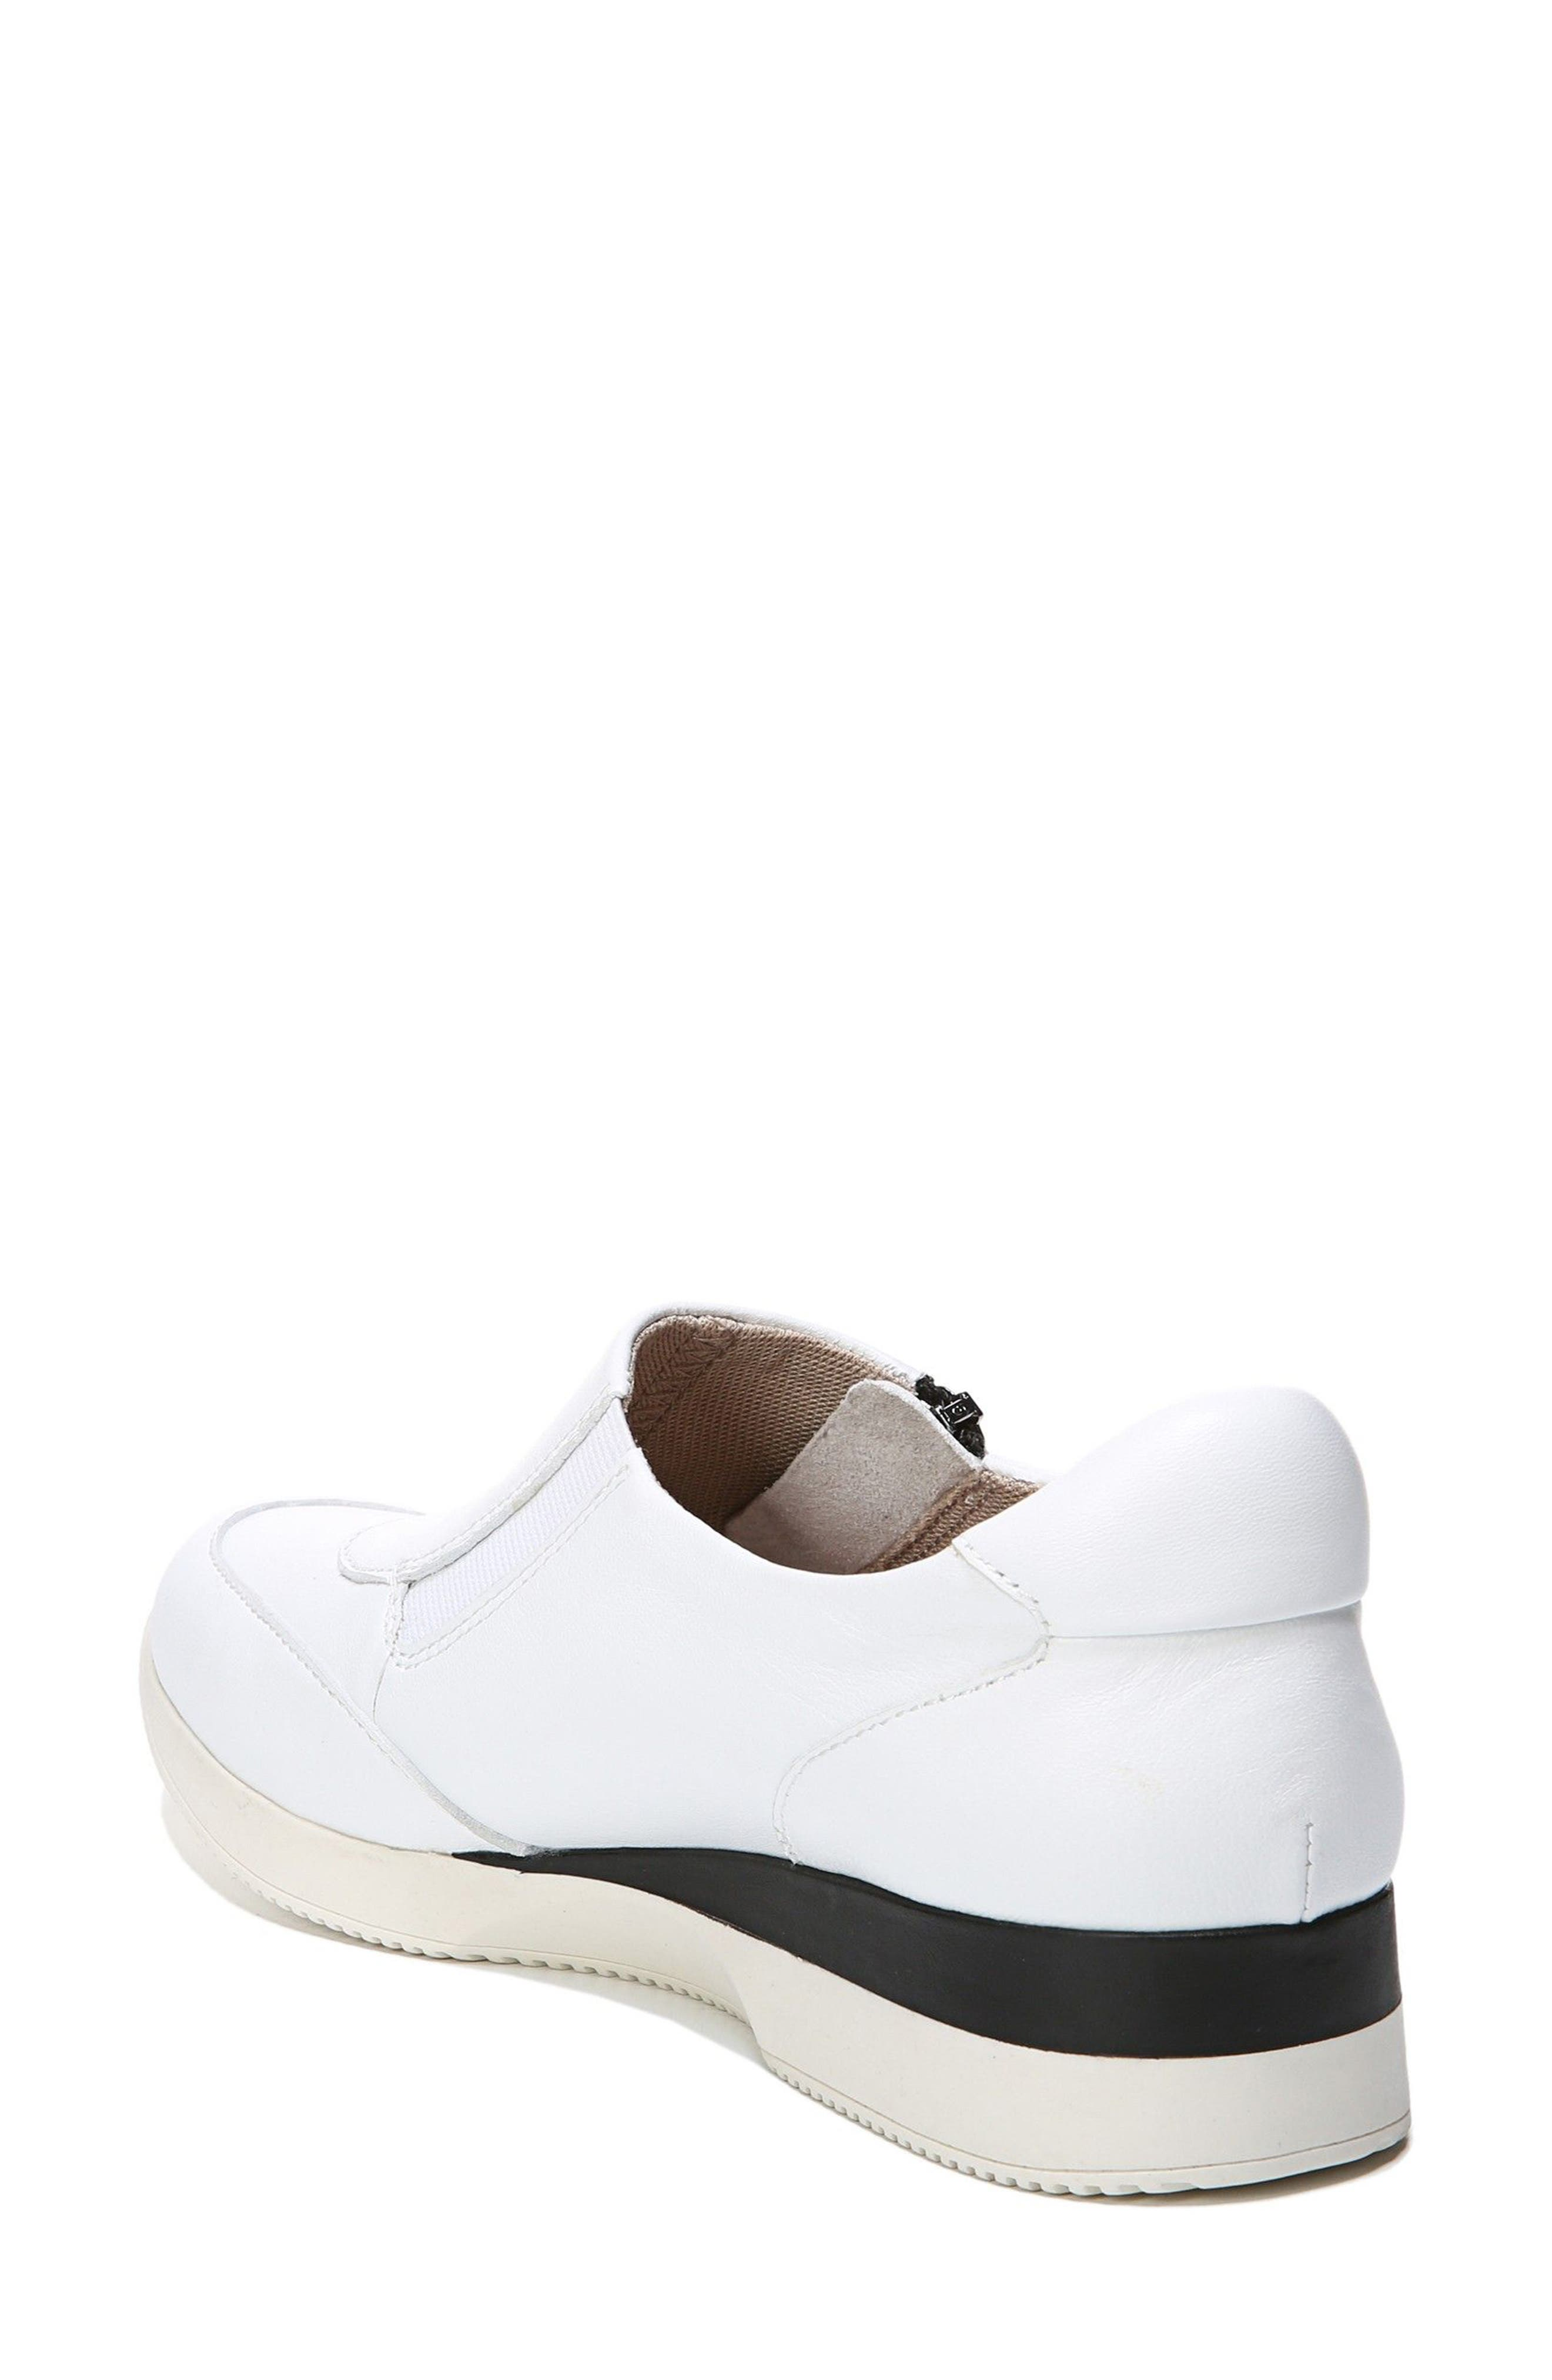 Alternate Image 2  - Naturalizer Jetty Sneaker (Women)